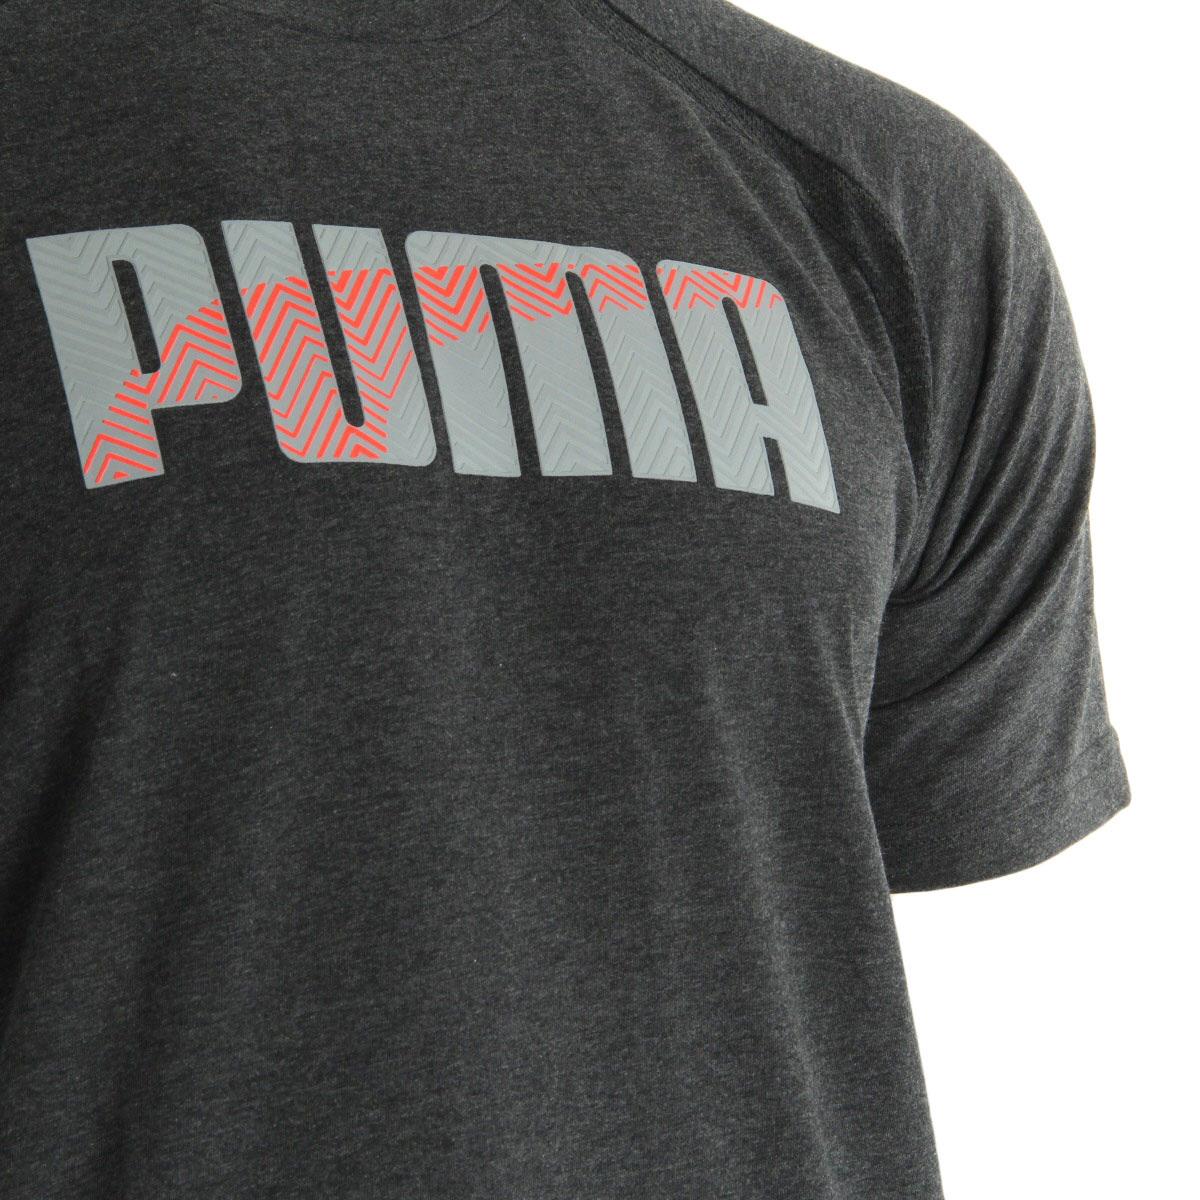 Puma Evostripe Tee 83828707, T-Shirts homme